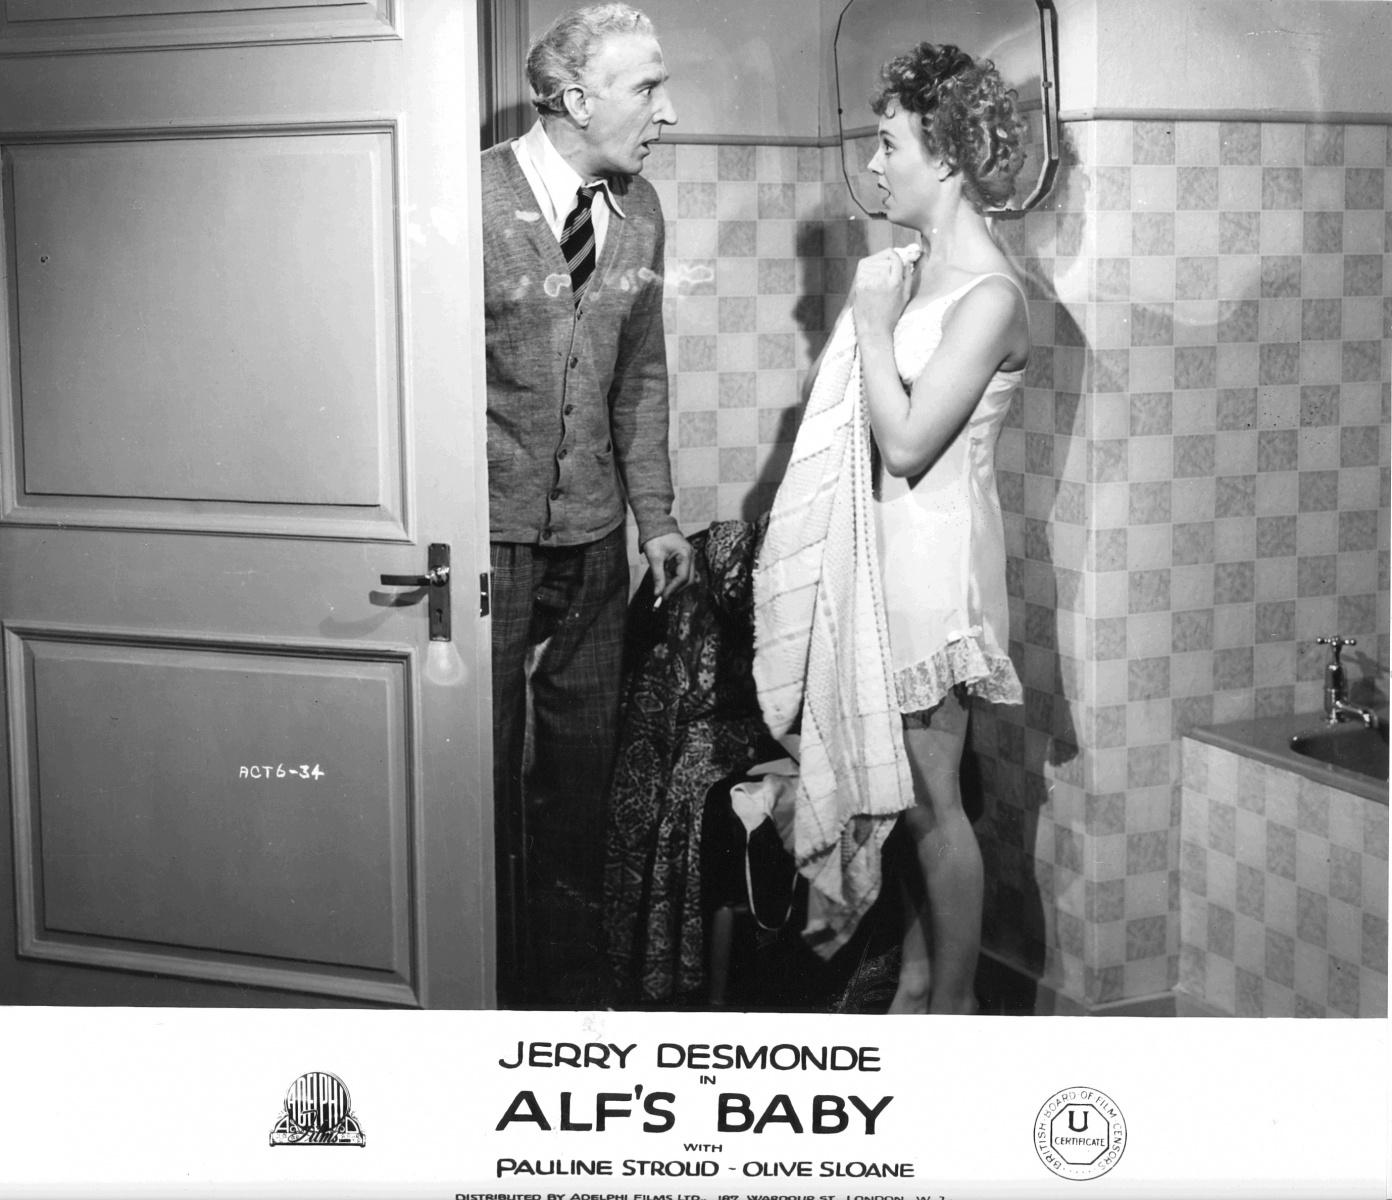 Alf's Baby